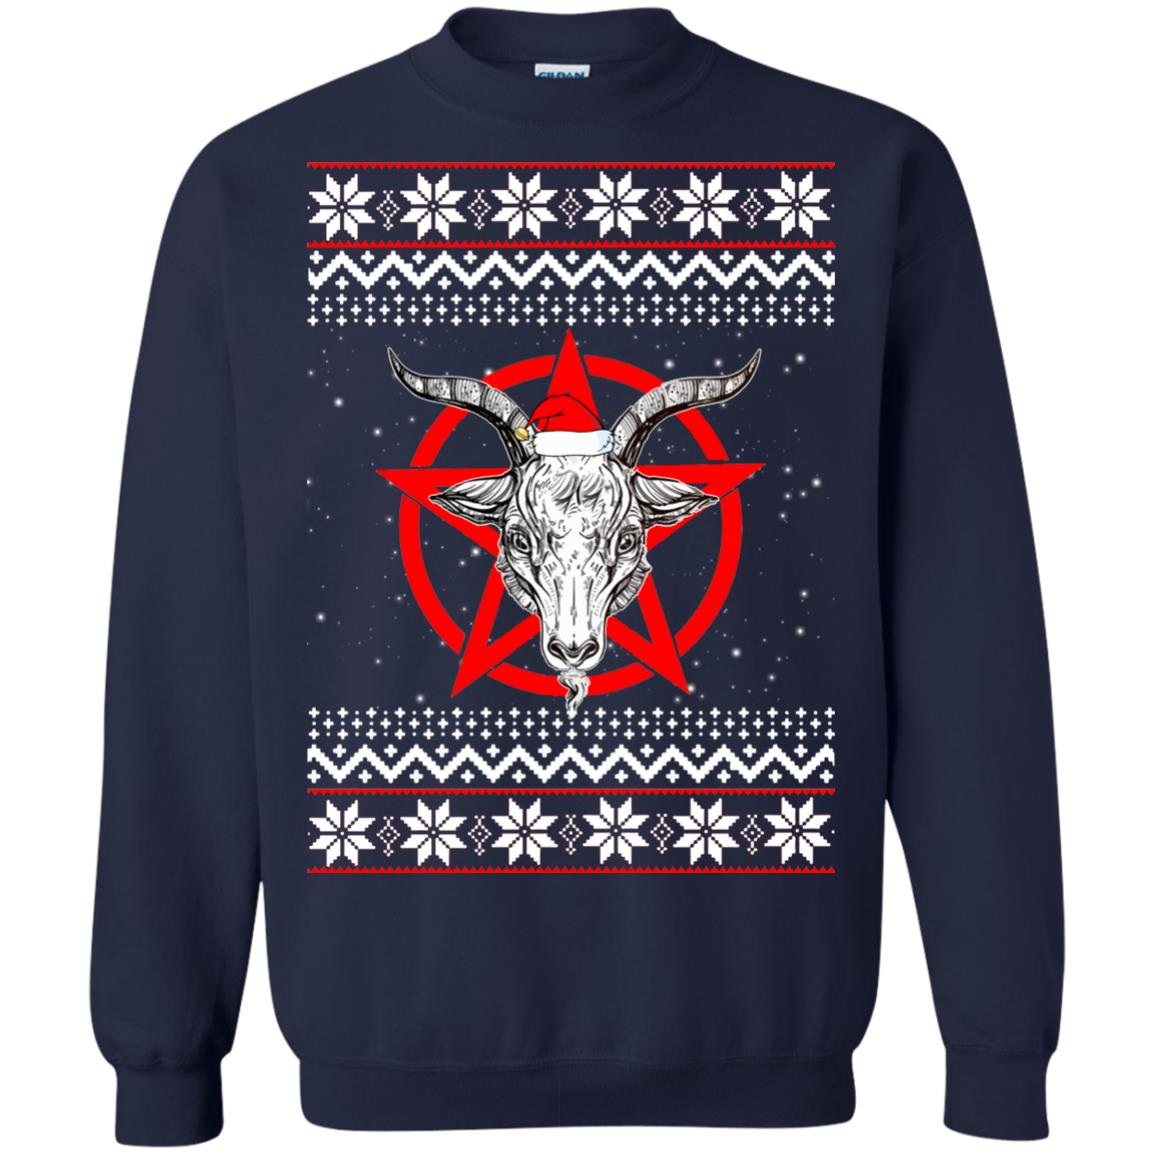 image 240 - Satanic Pentagram Christmas sweater, hoodie, long sleeve